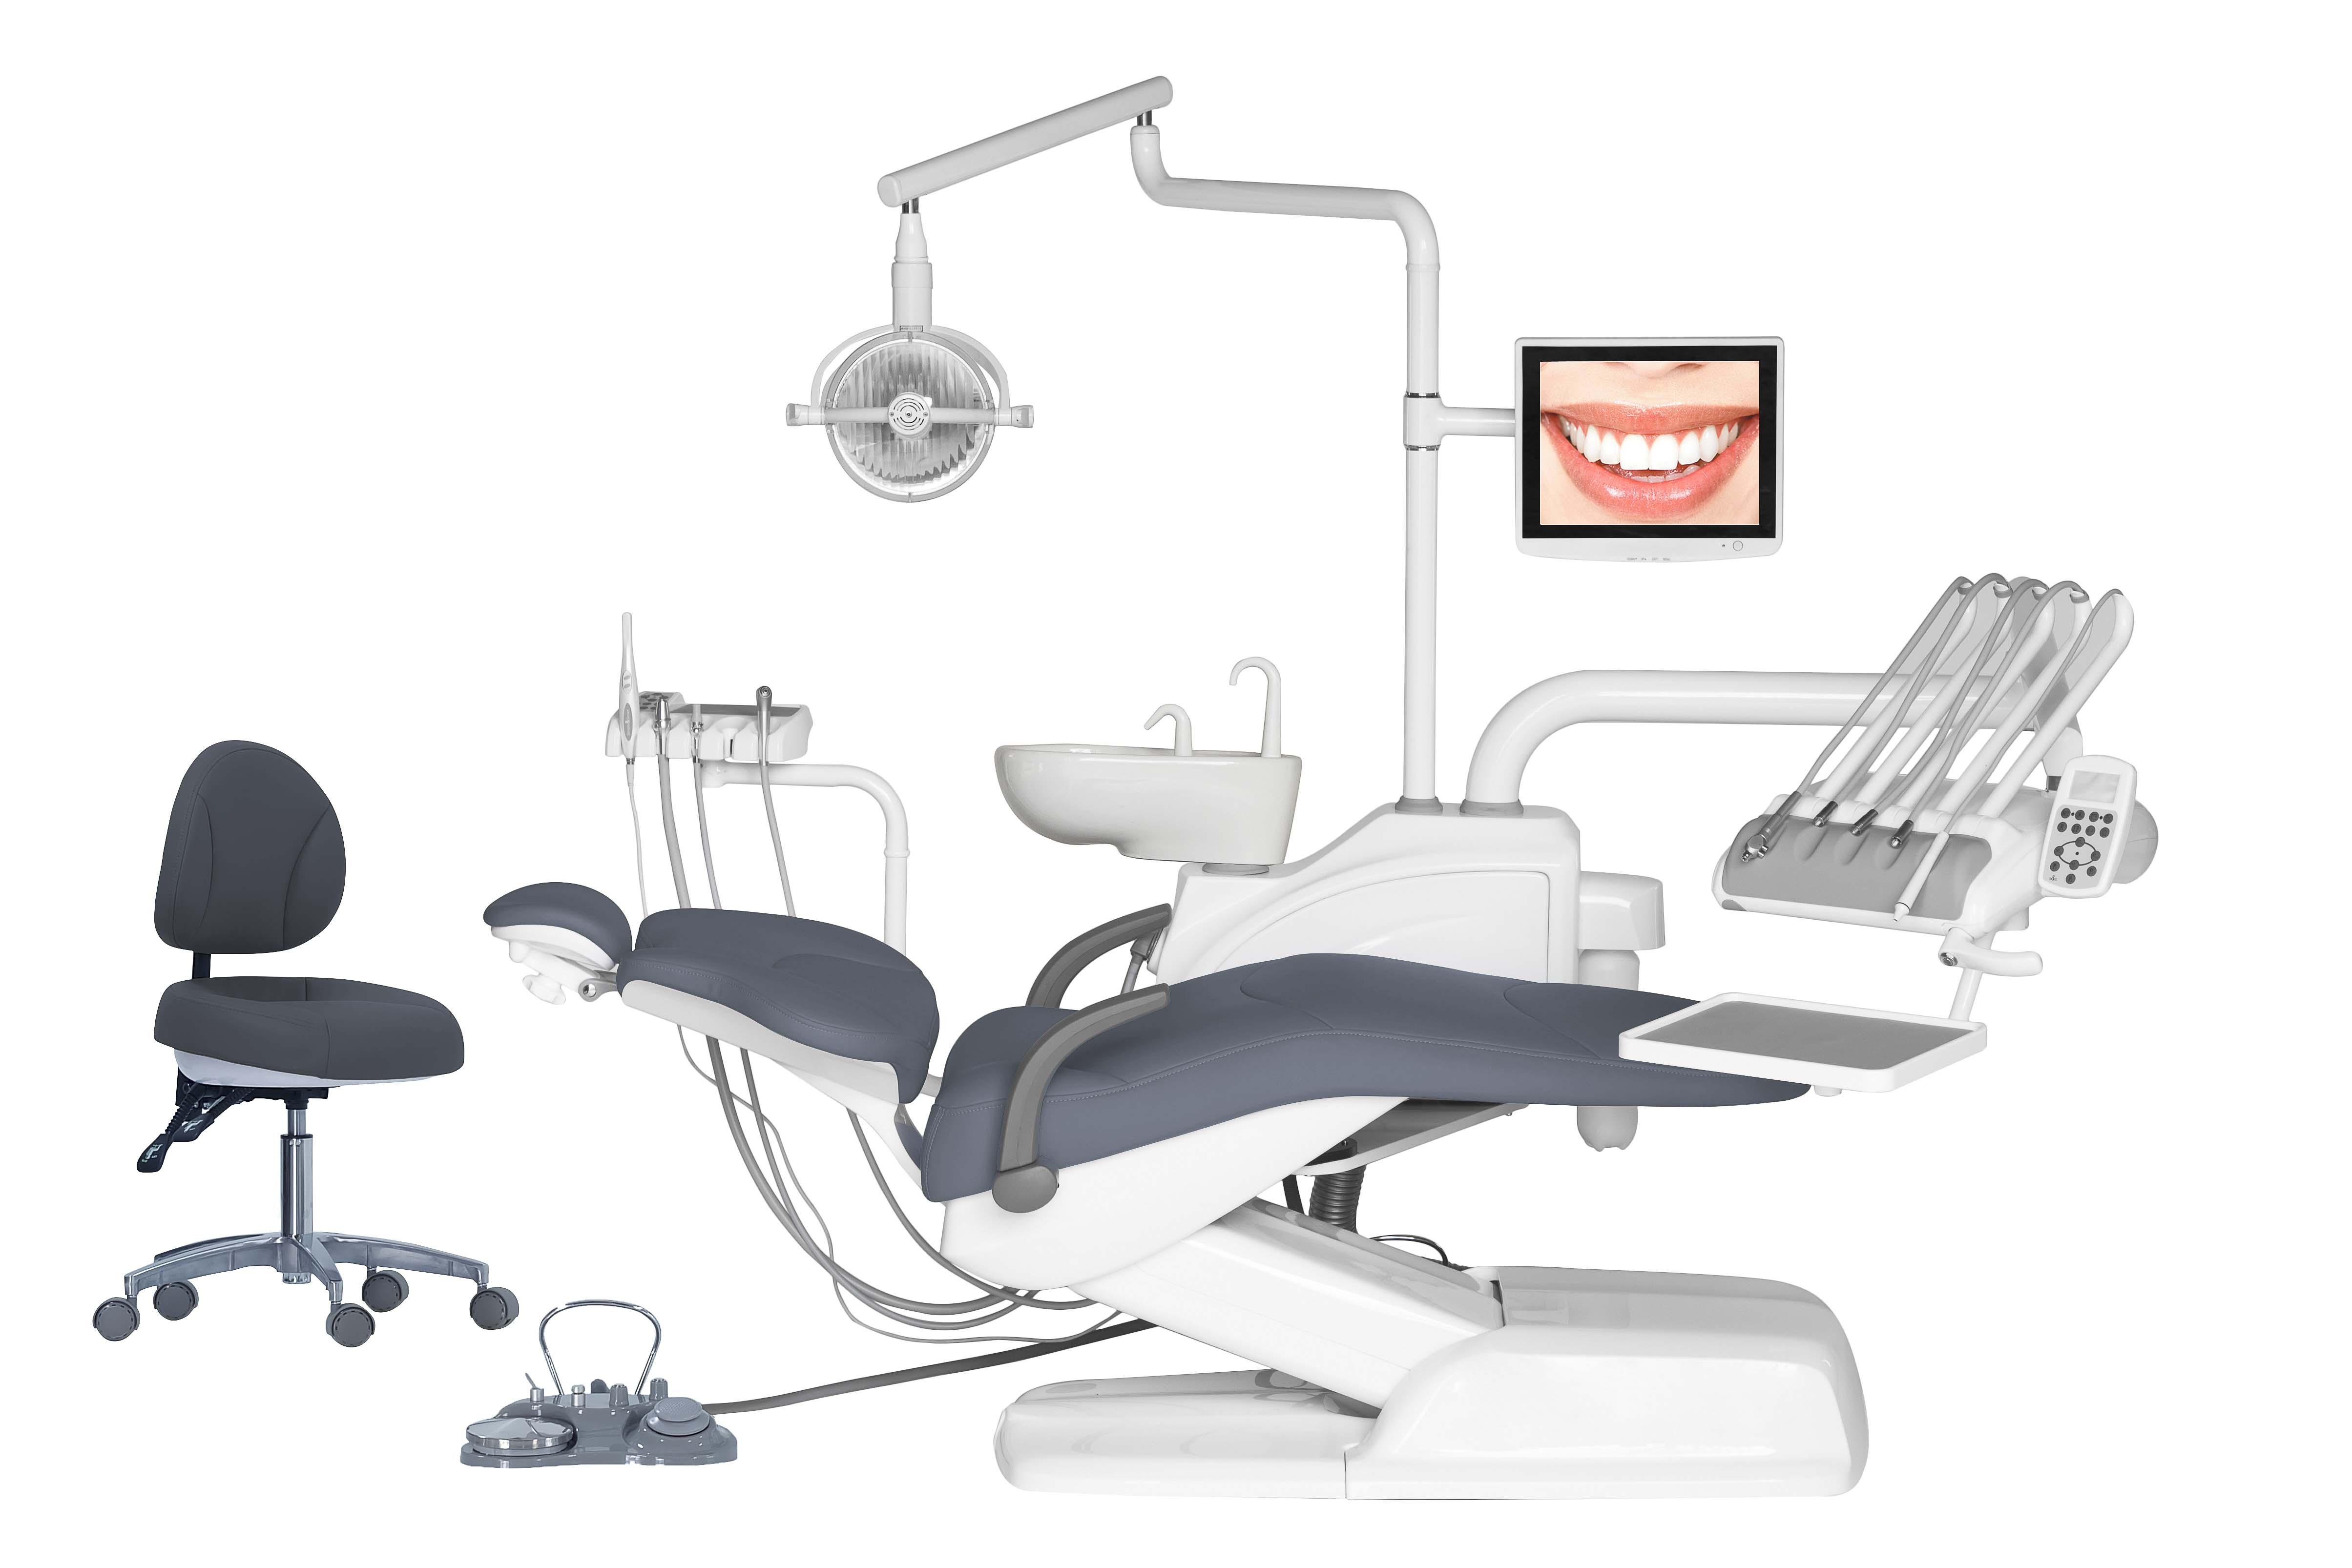 Riunito Odontoiatrico